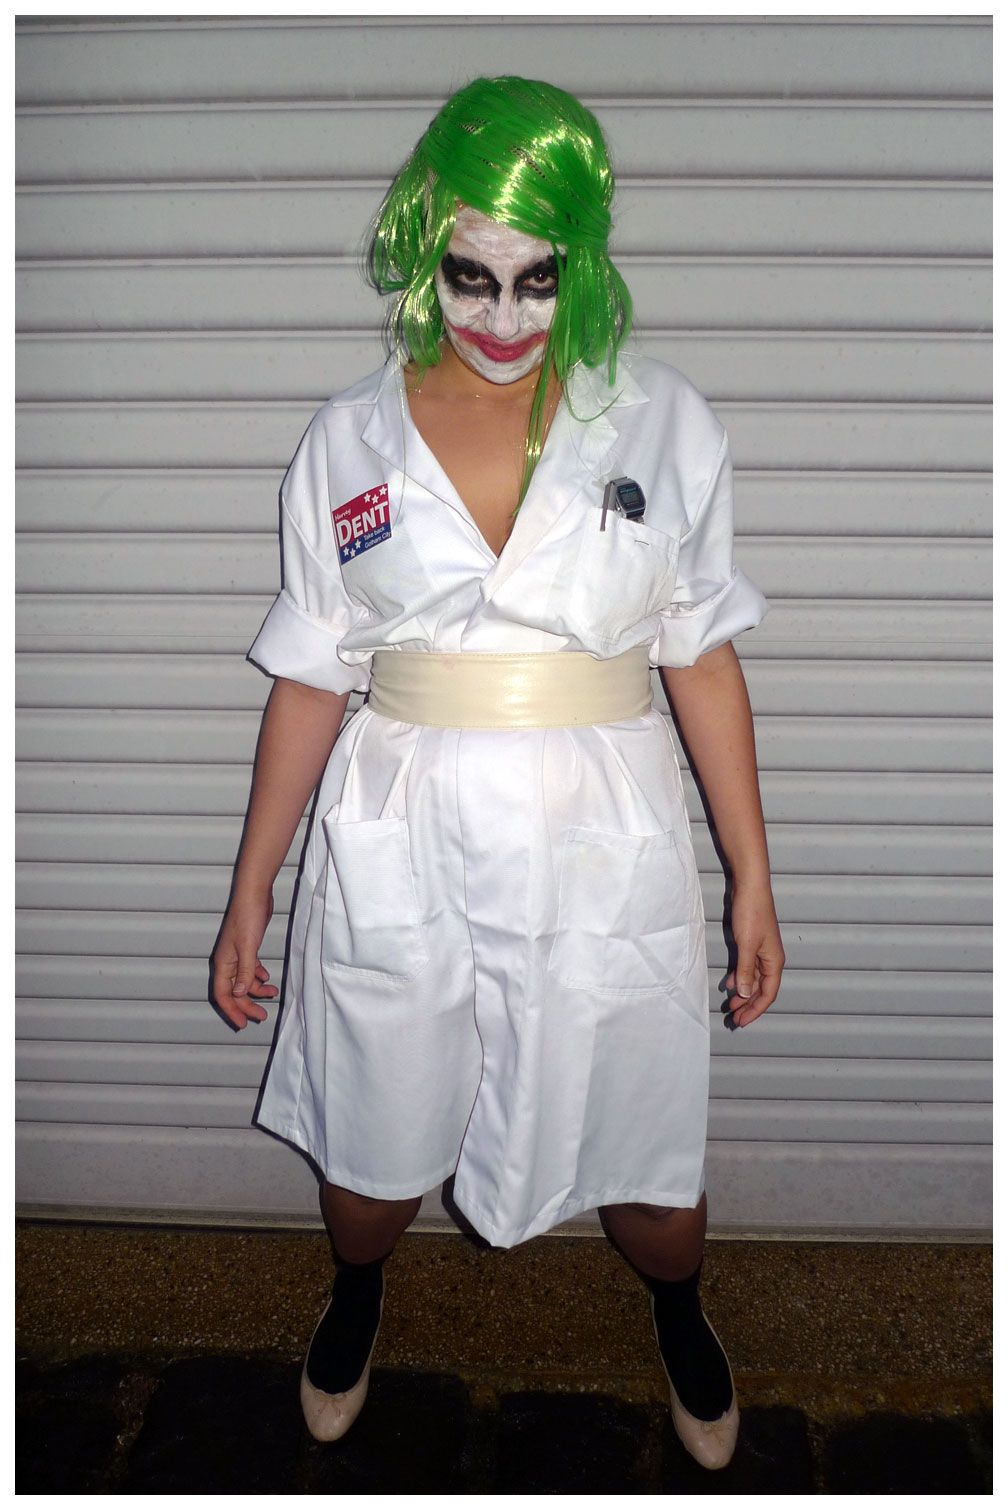 Heath Ledger Joker Nurse Costume. Get more #costume and #Halloween ...